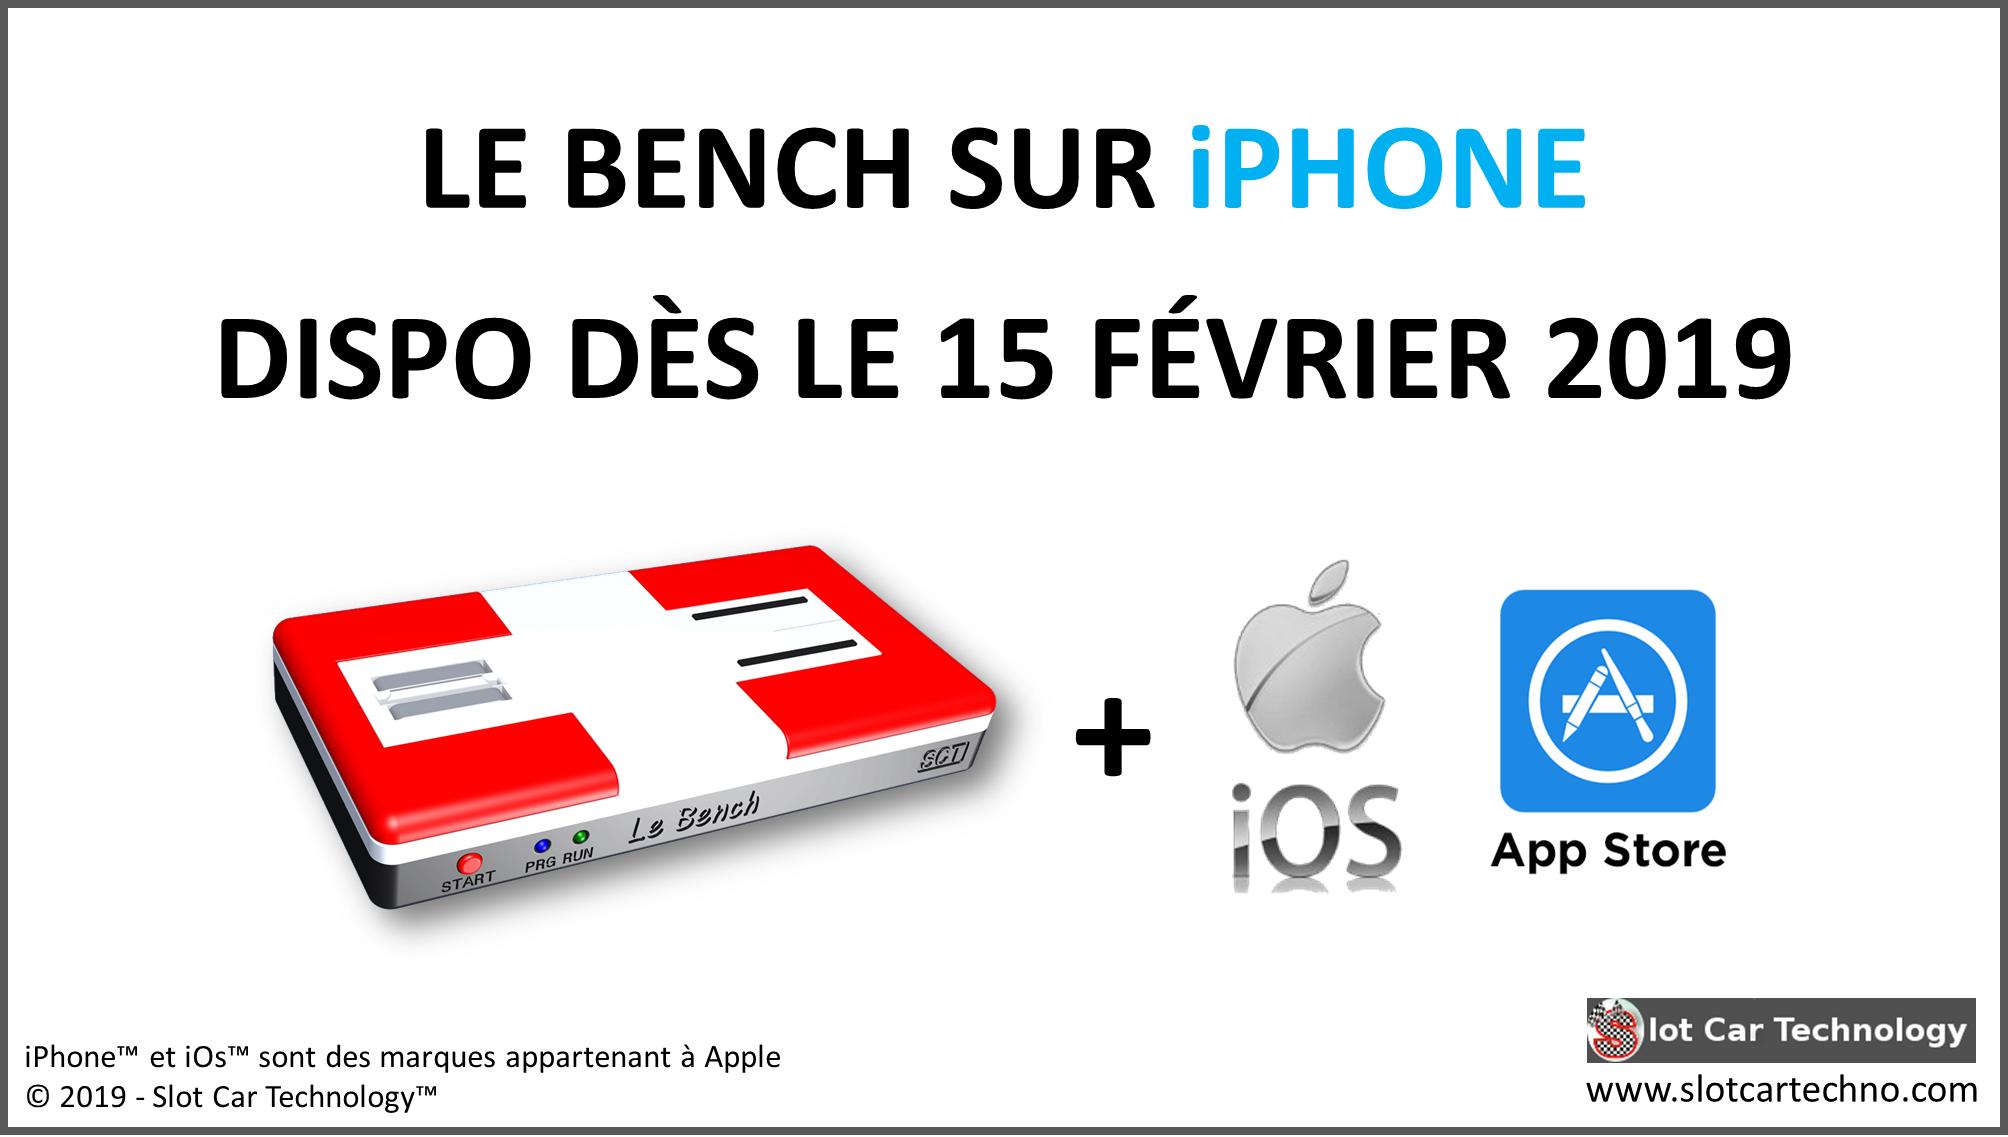 Slot Car Technology l'application iPhone du Bench arrive